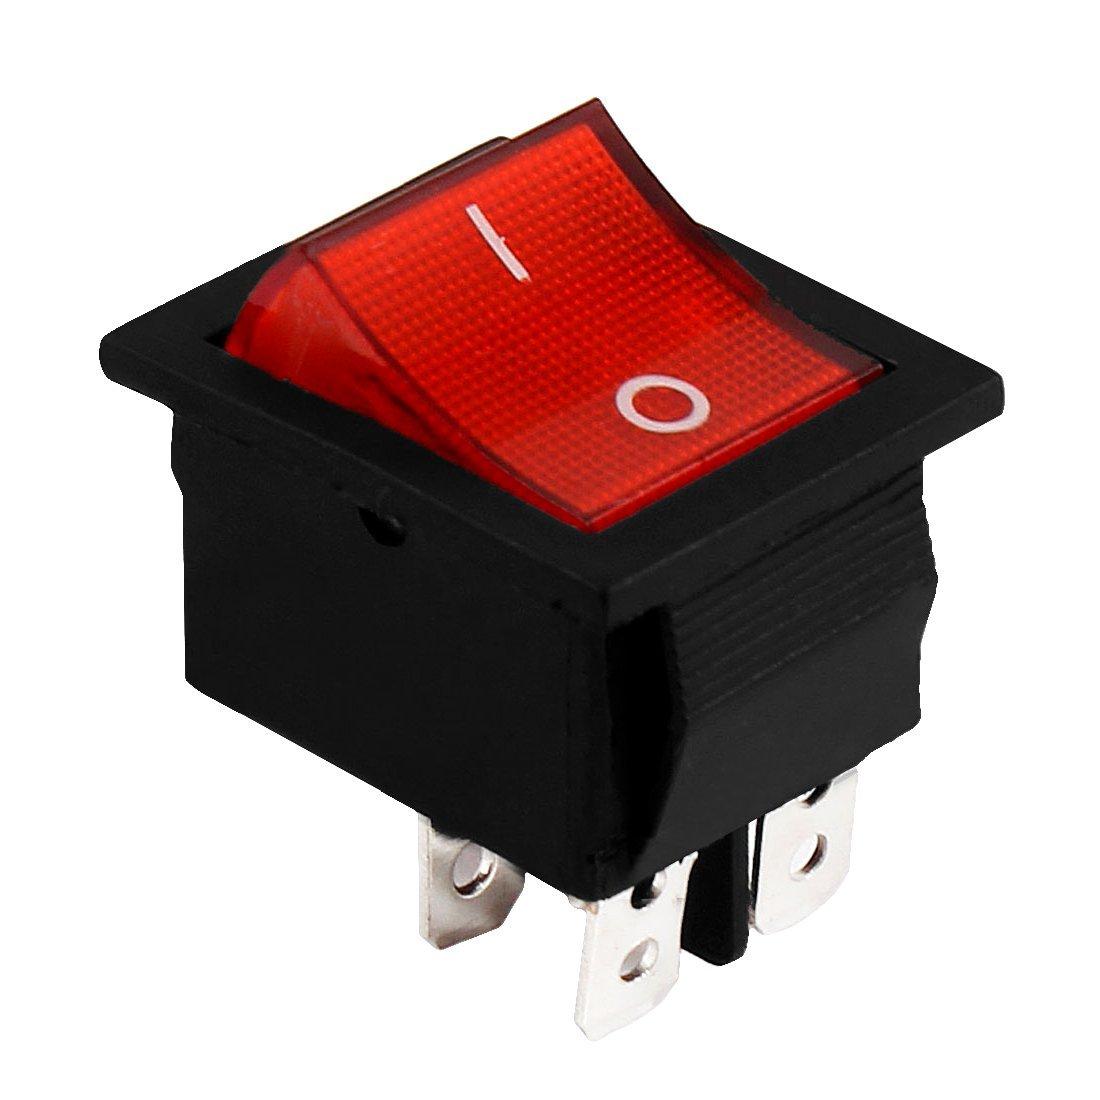 Cheap Dpst Switch Wiring, find Dpst Switch Wiring deals on line at ...